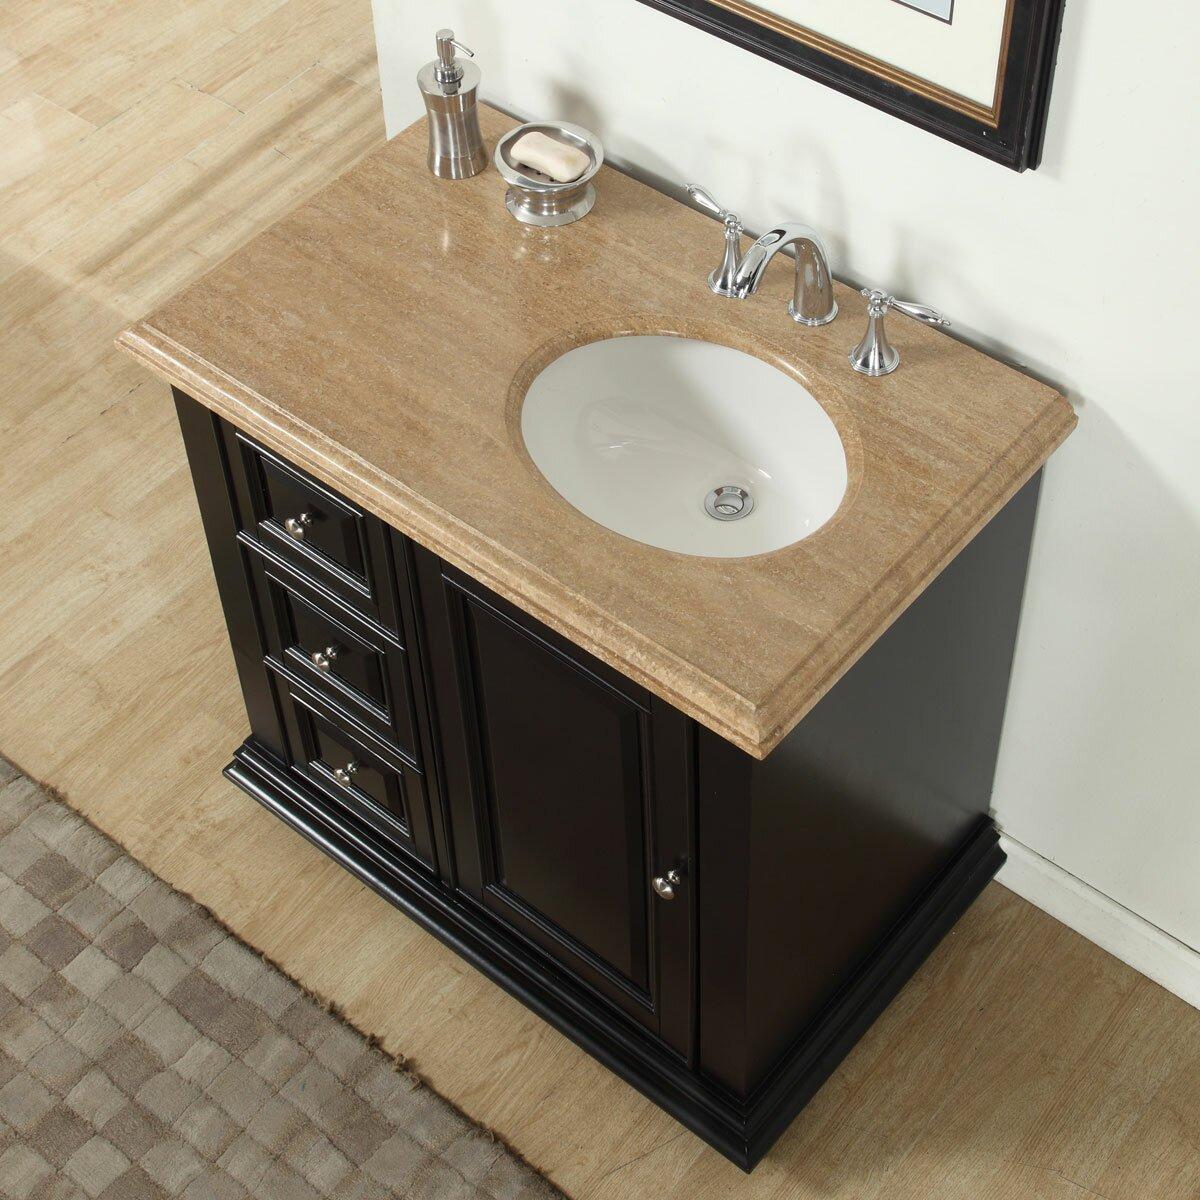 silkroad exclusive 36 single bathroom vanity set with sink on right side reviews wayfair. Black Bedroom Furniture Sets. Home Design Ideas